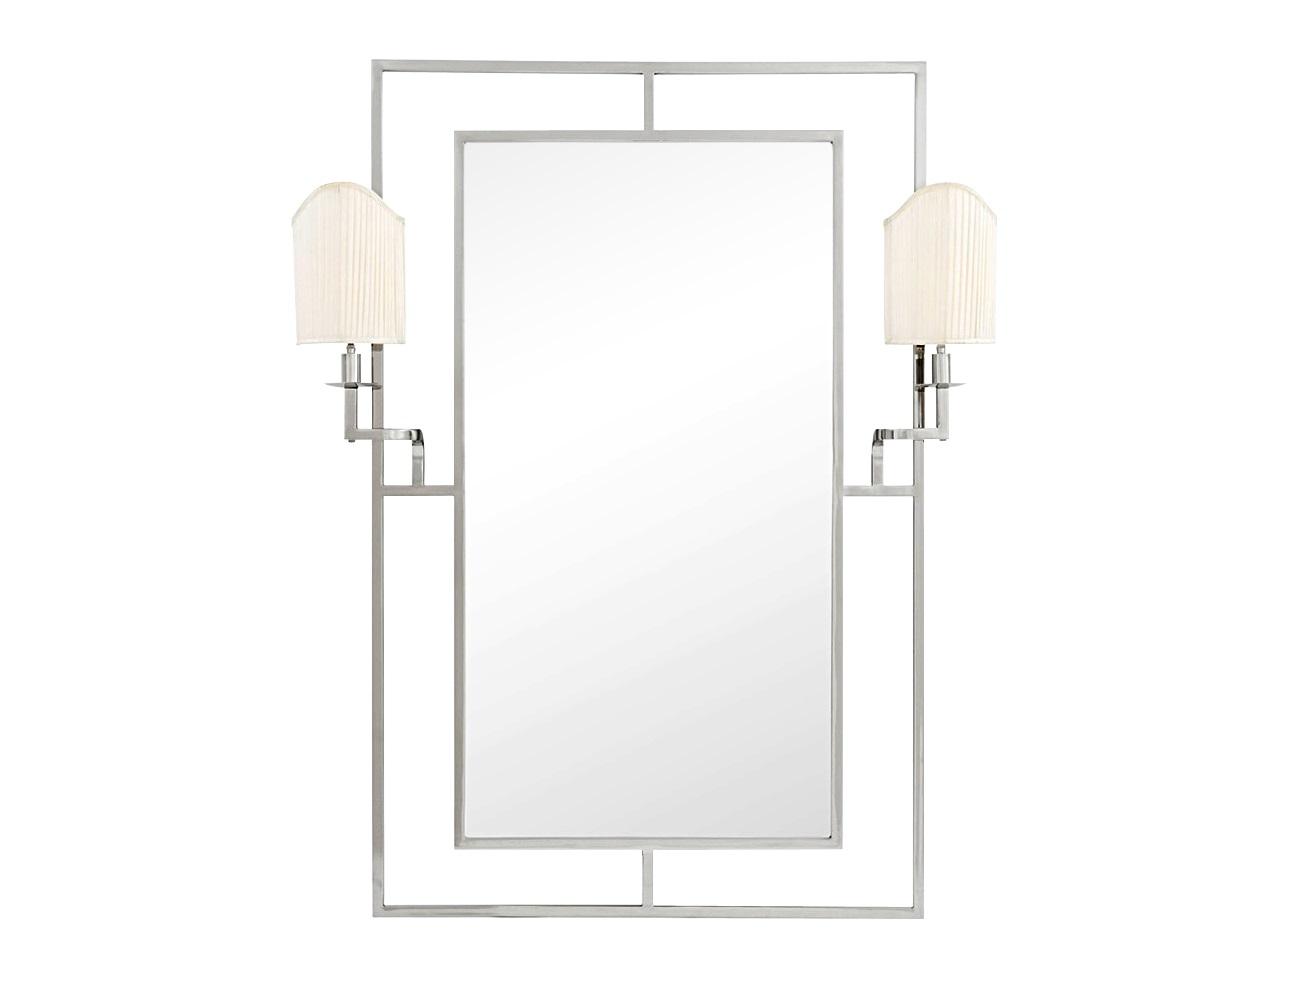 Зеркало Mirror AstaireНастенные зеркала<br>Зеркало Mirror Astaire в никелированной раме. На зеркале расположены 2 бра с текстильными абажурами белого цвета.&amp;lt;div&amp;gt;&amp;lt;div style=&amp;quot;line-height: 24.9999px;&amp;quot;&amp;gt;&amp;lt;br&amp;gt;&amp;lt;/div&amp;gt;&amp;lt;div style=&amp;quot;line-height: 24.9999px;&amp;quot;&amp;gt;Вид цоколя: Е14&amp;lt;/div&amp;gt;&amp;lt;div style=&amp;quot;line-height: 24.9999px;&amp;quot;&amp;gt;Мощность: 40W&amp;lt;/div&amp;gt;&amp;lt;div style=&amp;quot;line-height: 24.9999px;&amp;quot;&amp;gt;Количество ламп: 2&amp;lt;/div&amp;gt;&amp;lt;/div&amp;gt;<br><br>Material: Стекло<br>Ширина см: 113.0<br>Высота см: 140.0